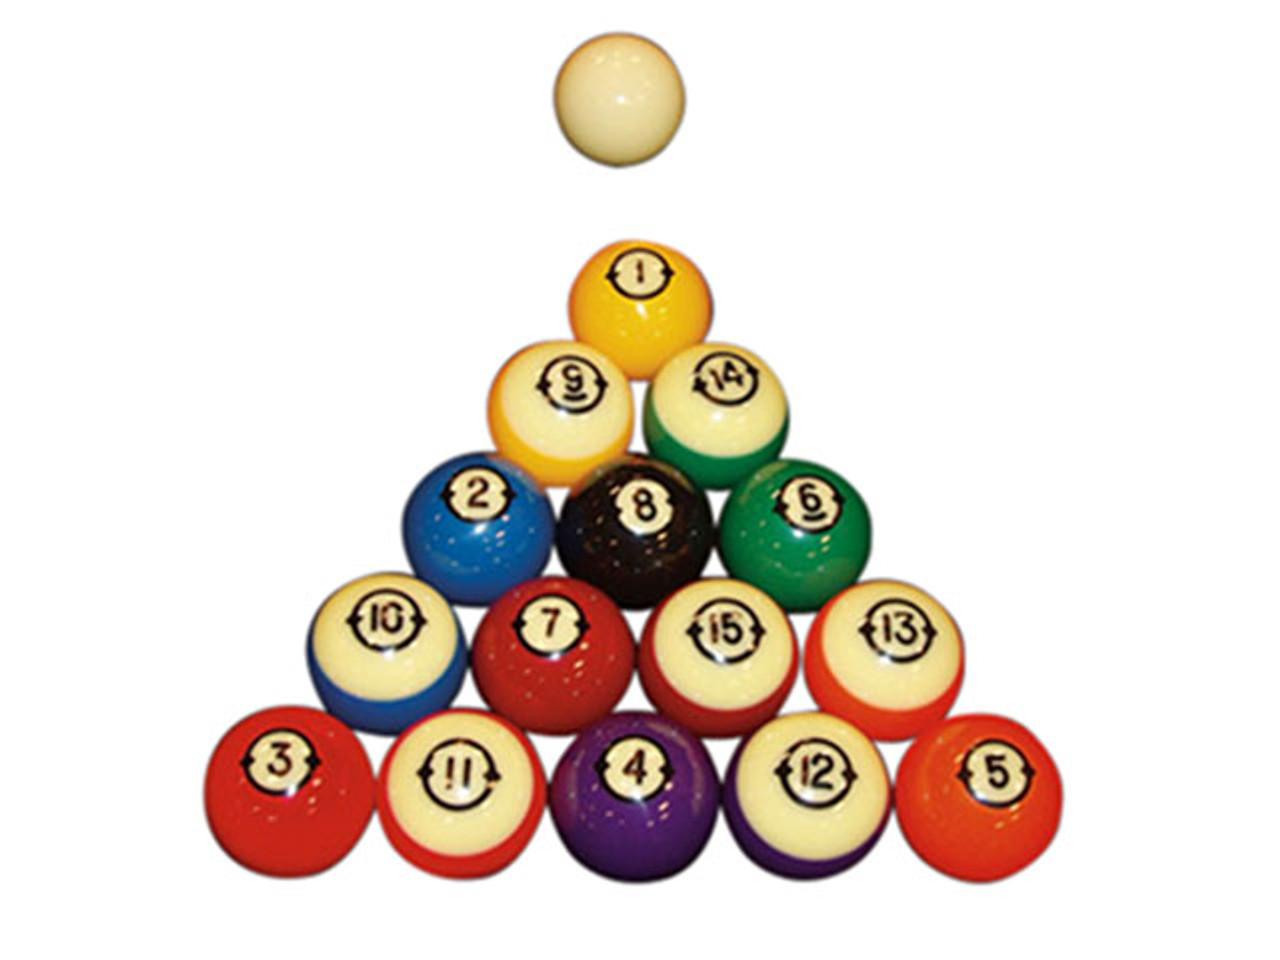 Renaissance Billiard Balls The Pool Table Store